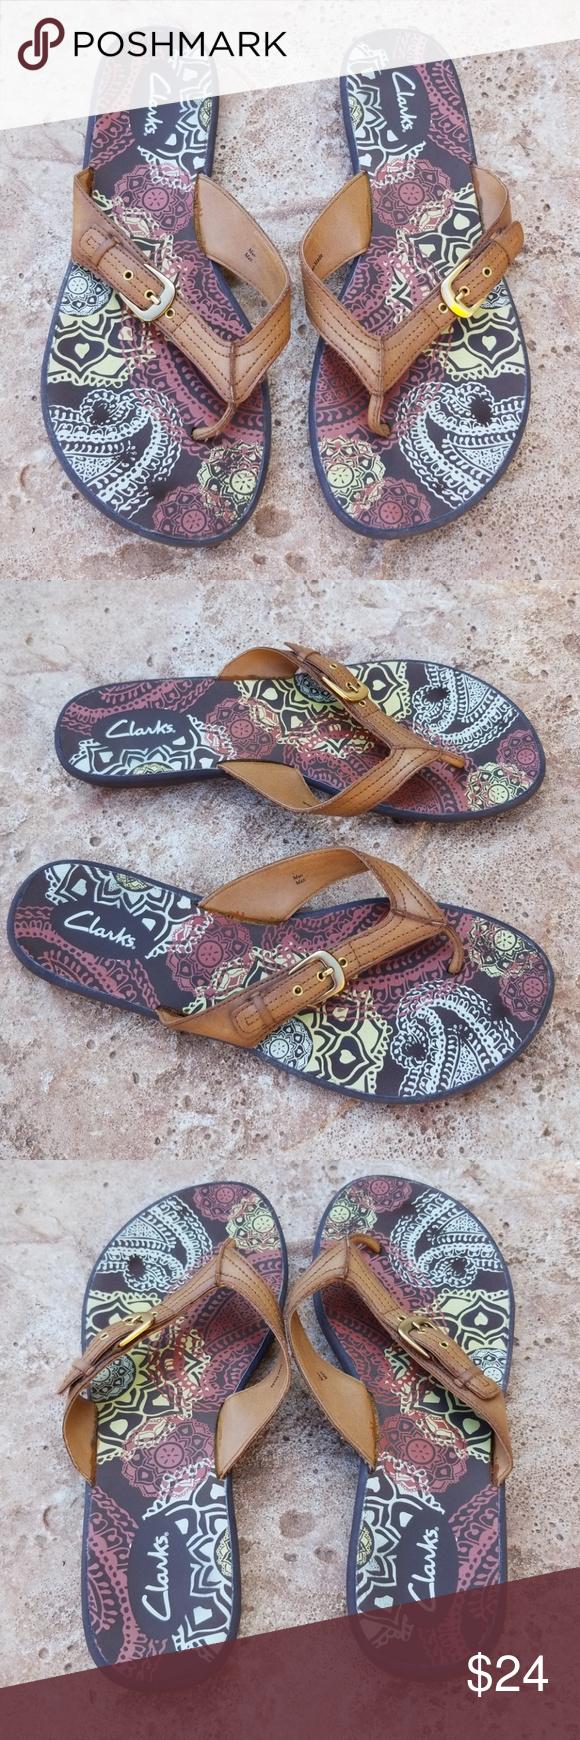 ef6749a0913a Clarks Camel Tan Brown Graphic Flip Flop Sandals 9 Super comfy flip flop  sandals from Clarks